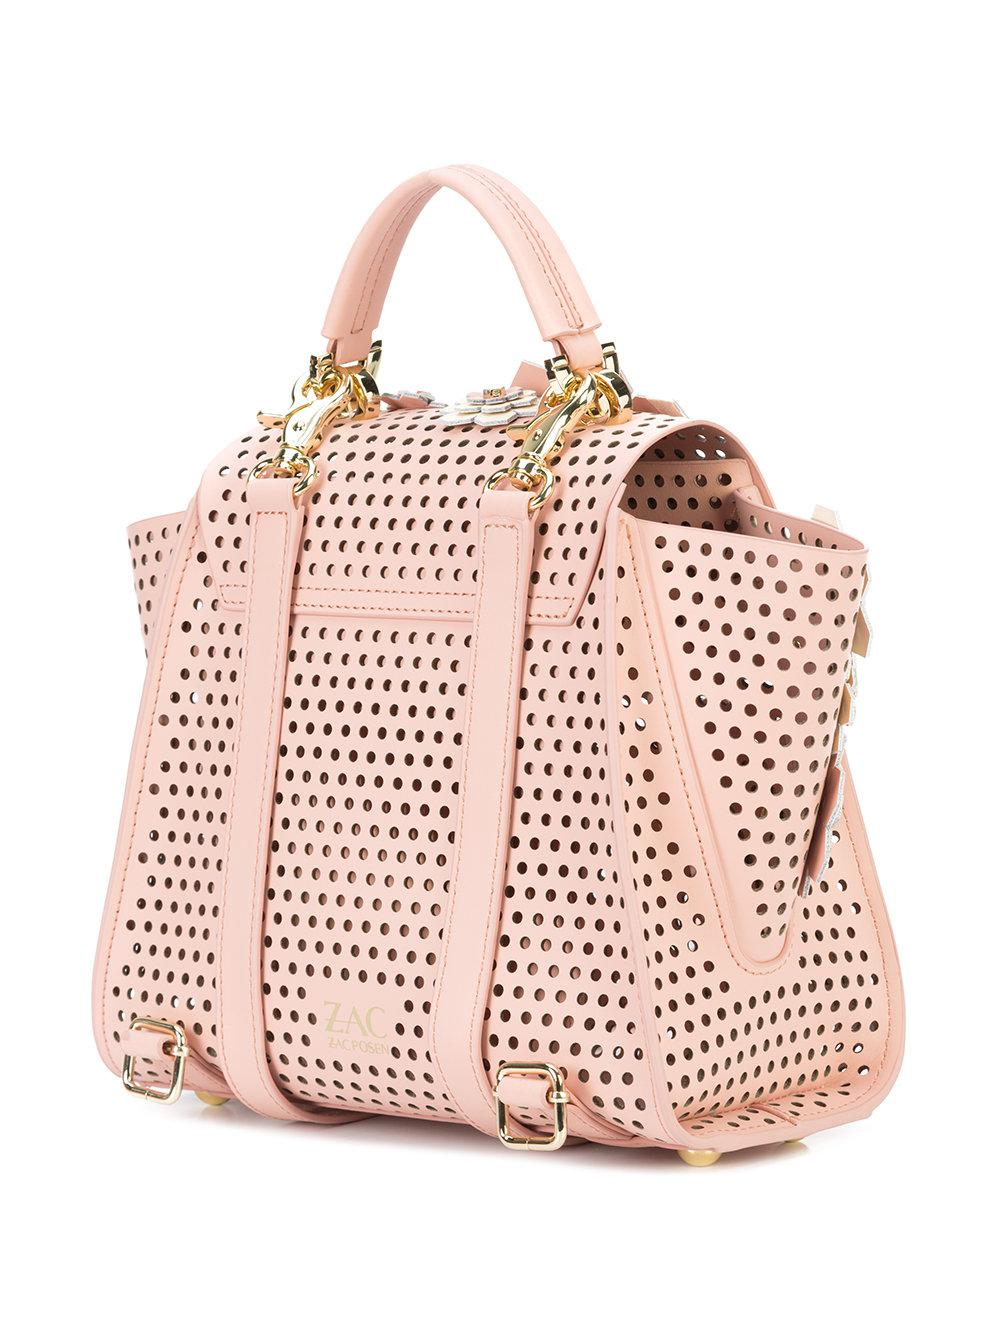 Zac Zac Posen Leather Eartha Kit Convertible Backpack in Pink & Purple (Pink)